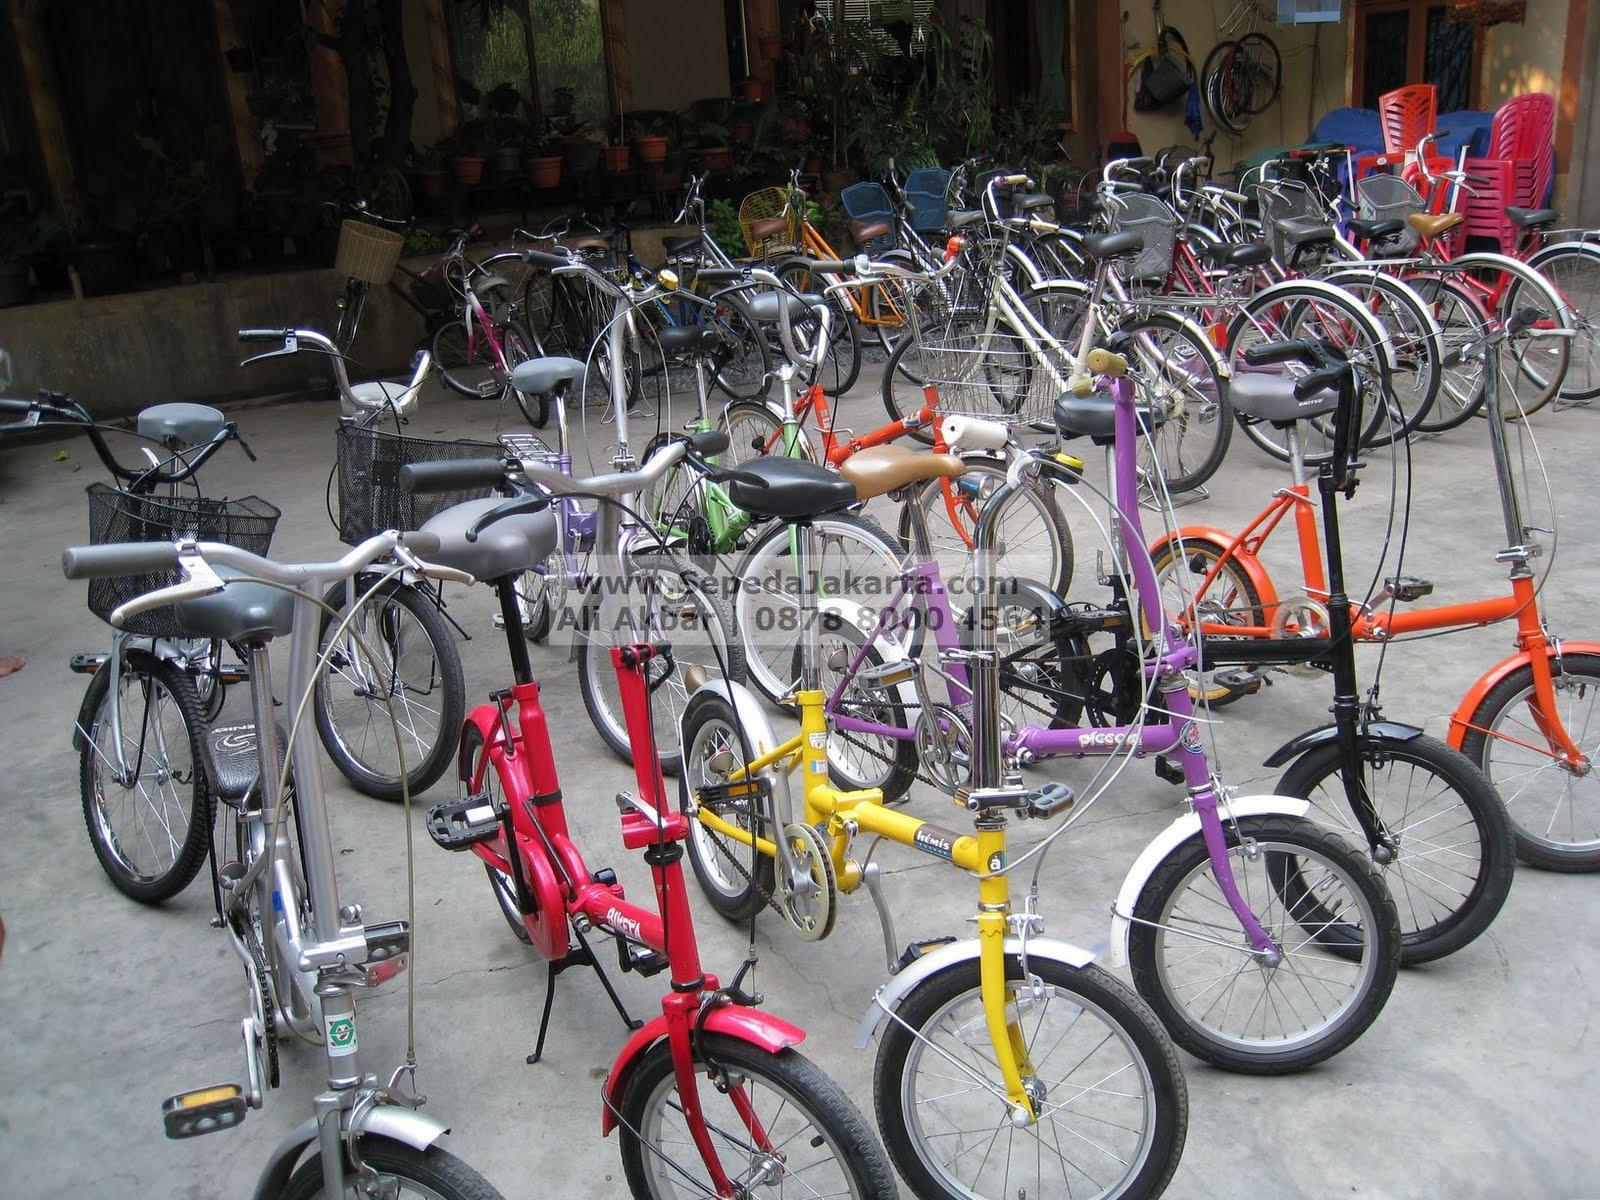 Sewa Sepeda   Sewa Sepeda di Jakarta   Sewa Sepeda Murah